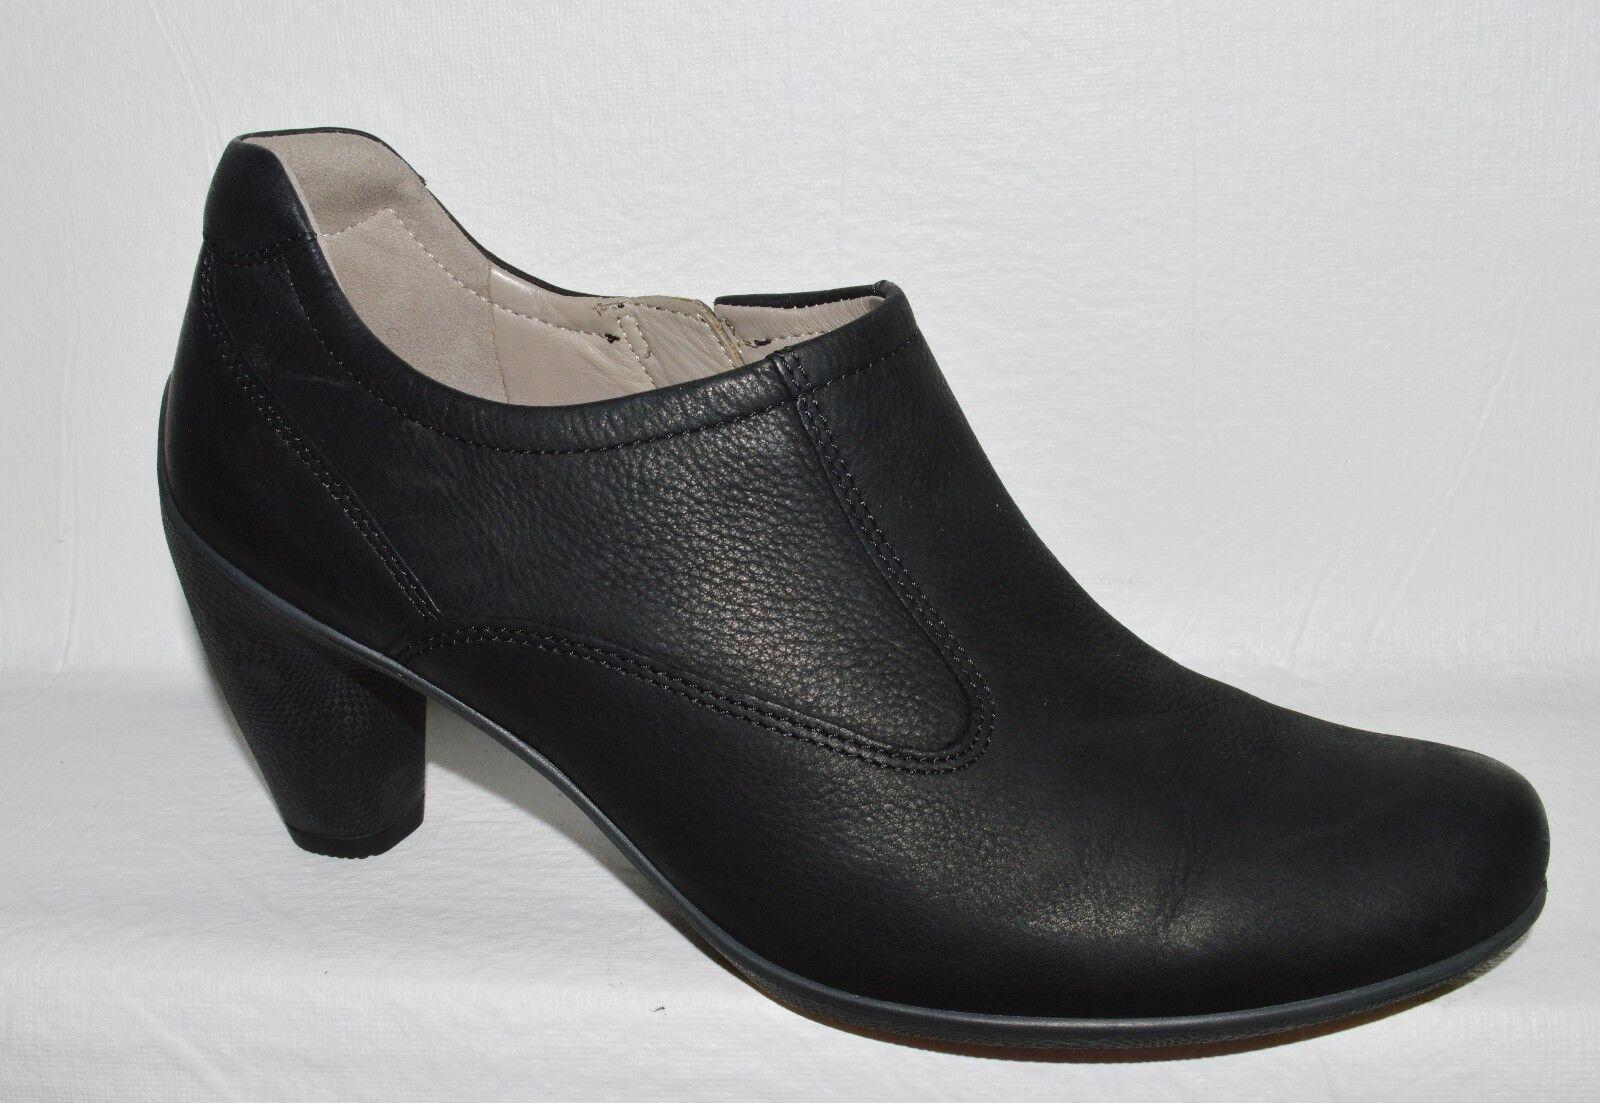 ECCO SZ 9 M 40 BLACK LEATHER BOOTIES PUMPS HEELS Schuhe EXCELLENT CONDITION